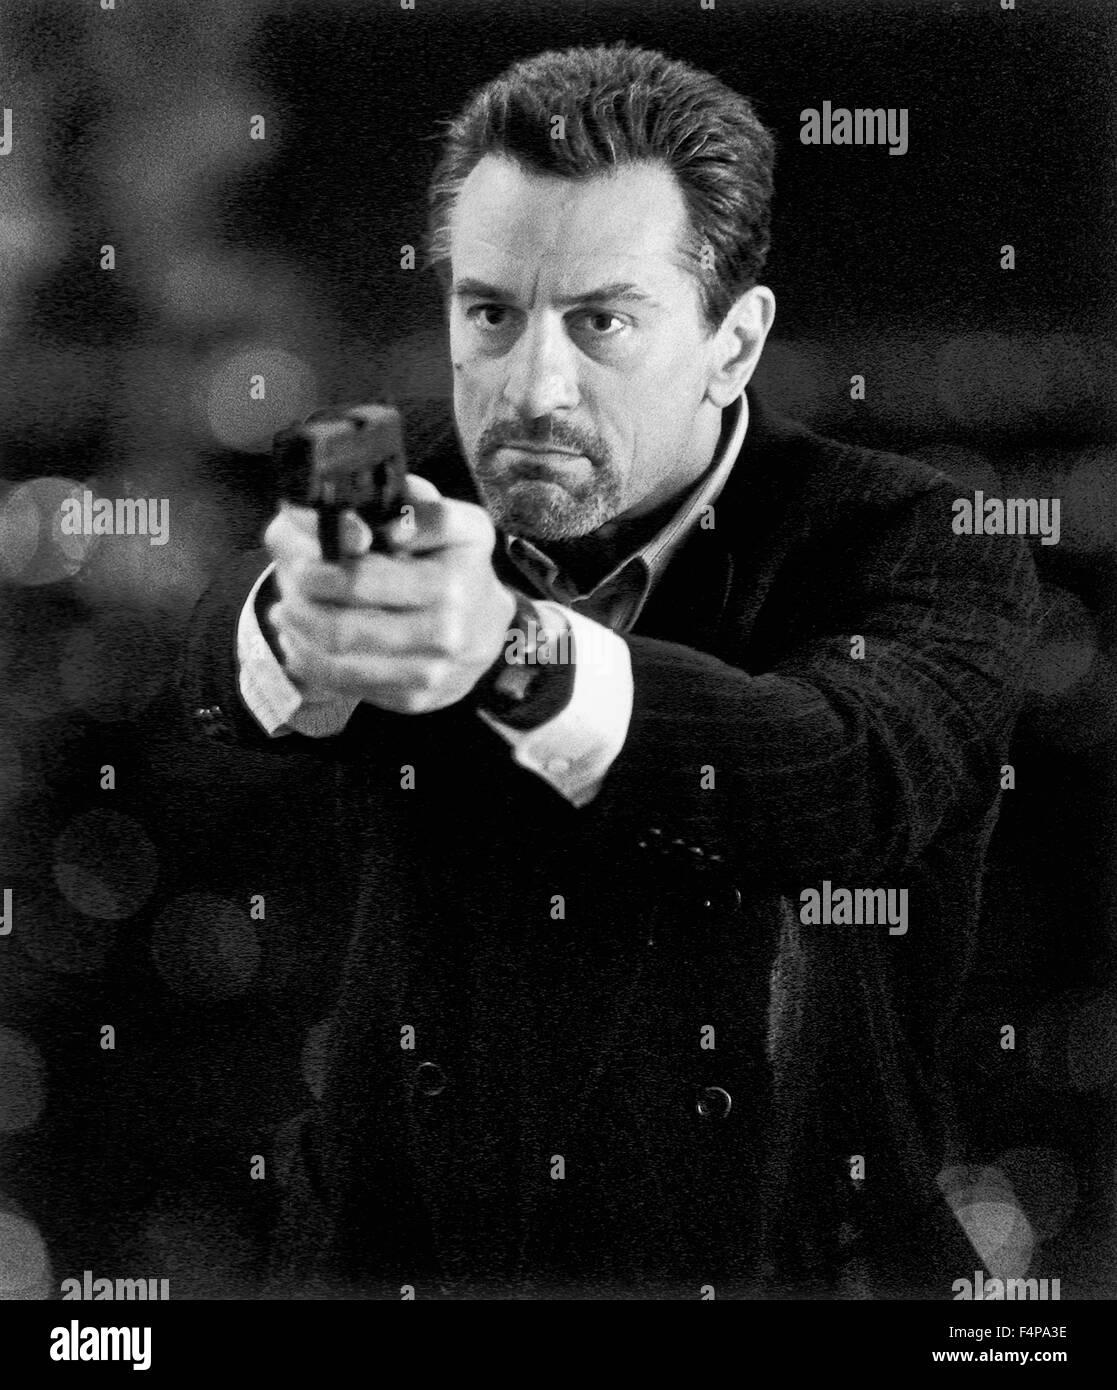 Robert de Niro / Heat 1995 directed by Michael Mann - Stock Image